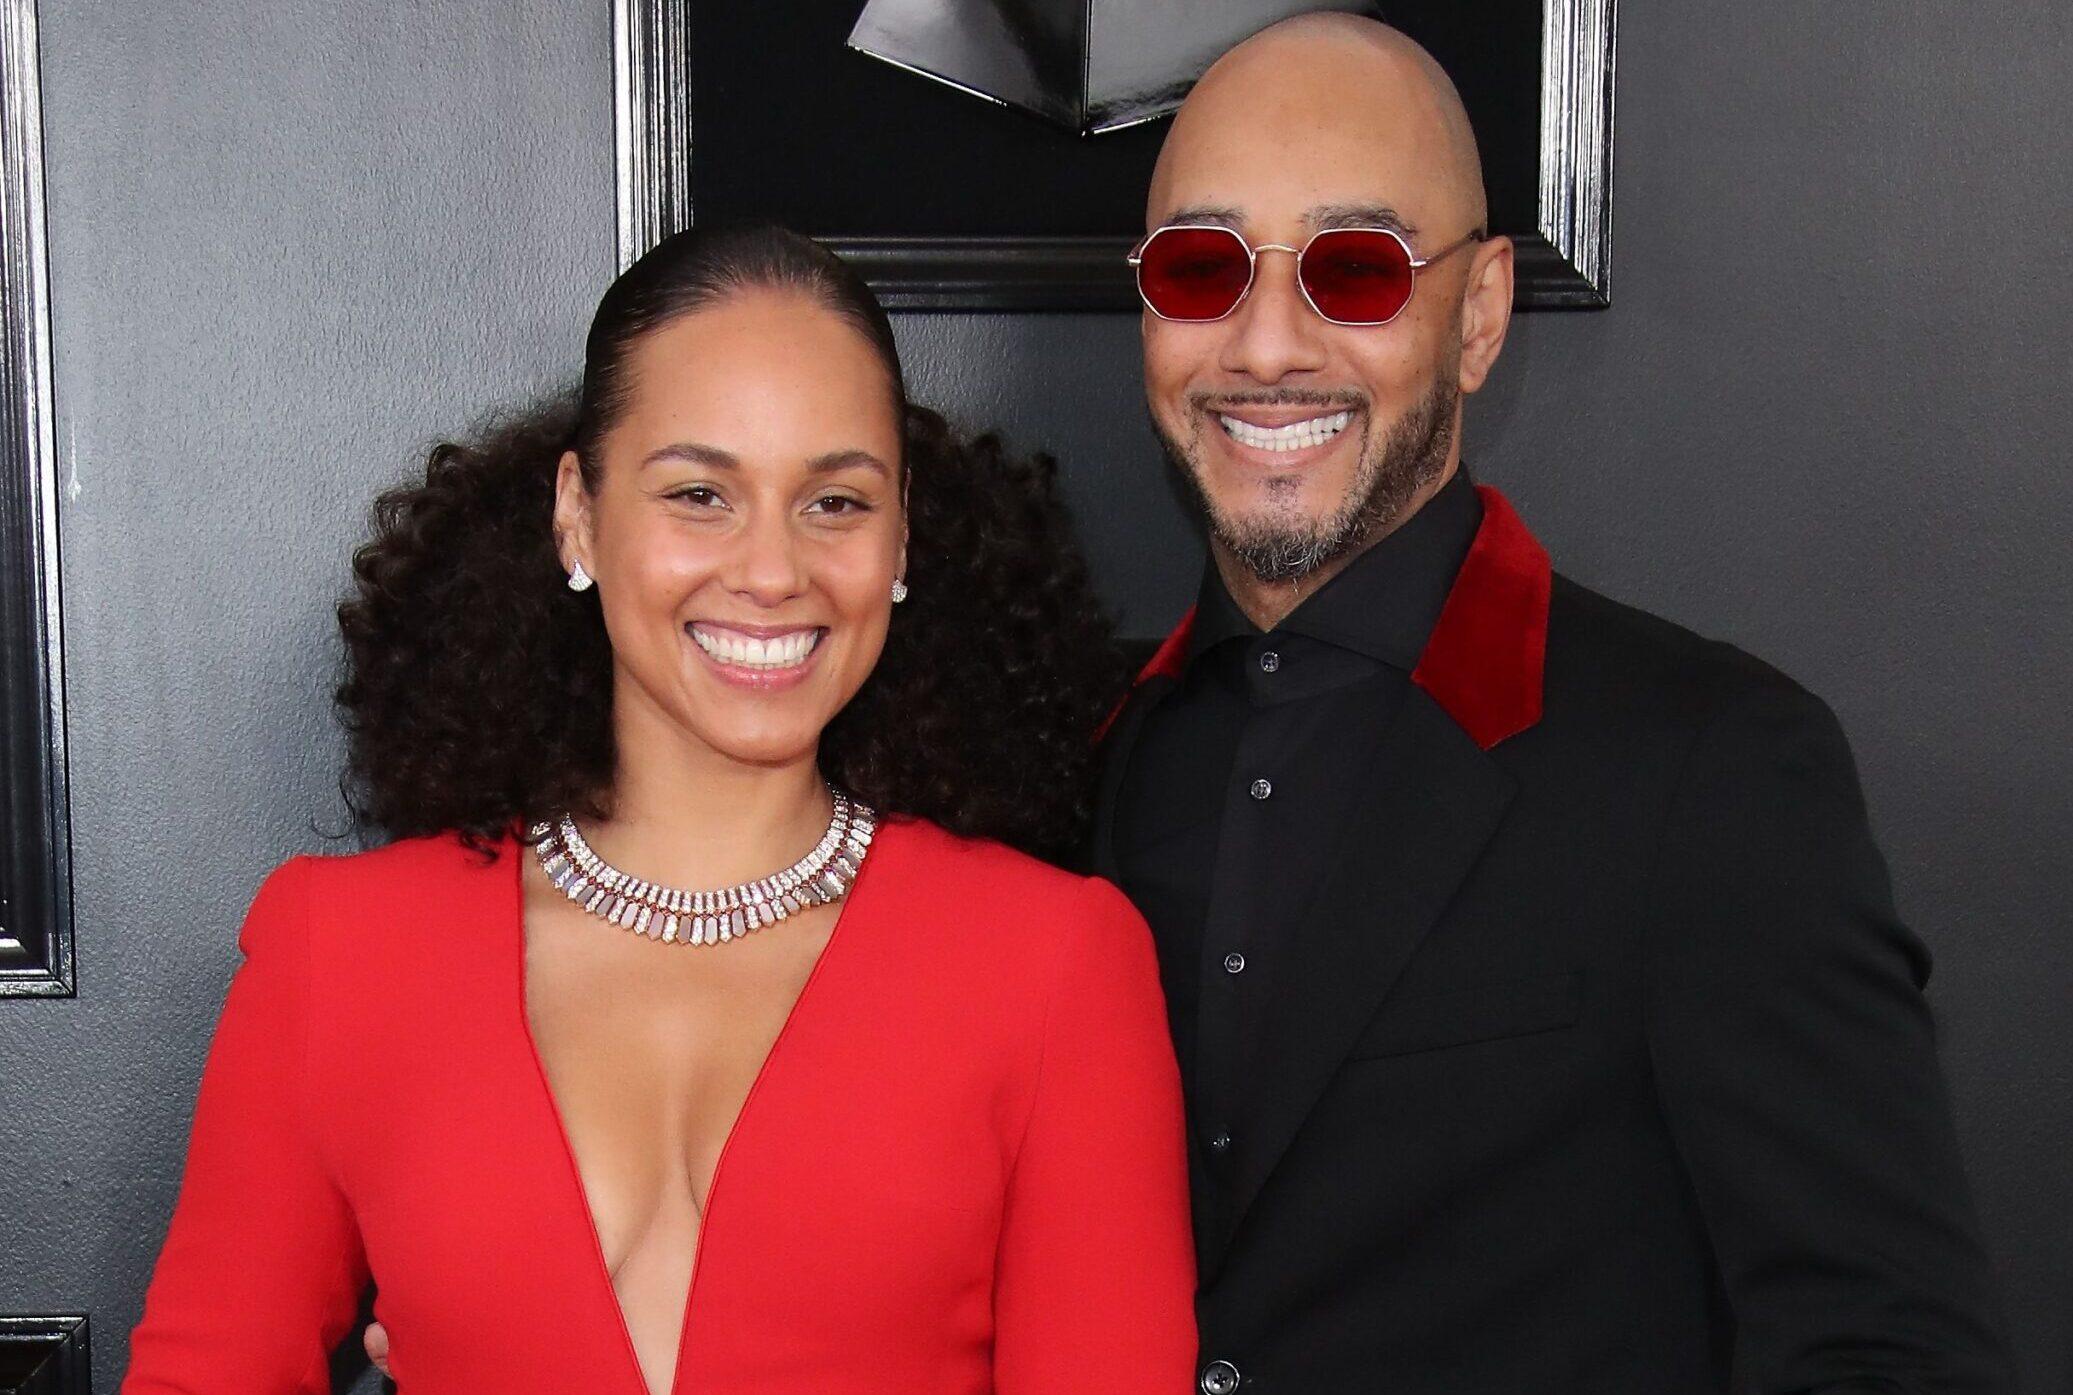 Alicia Keys Shares Loving Post for Her Wedding Anniversary